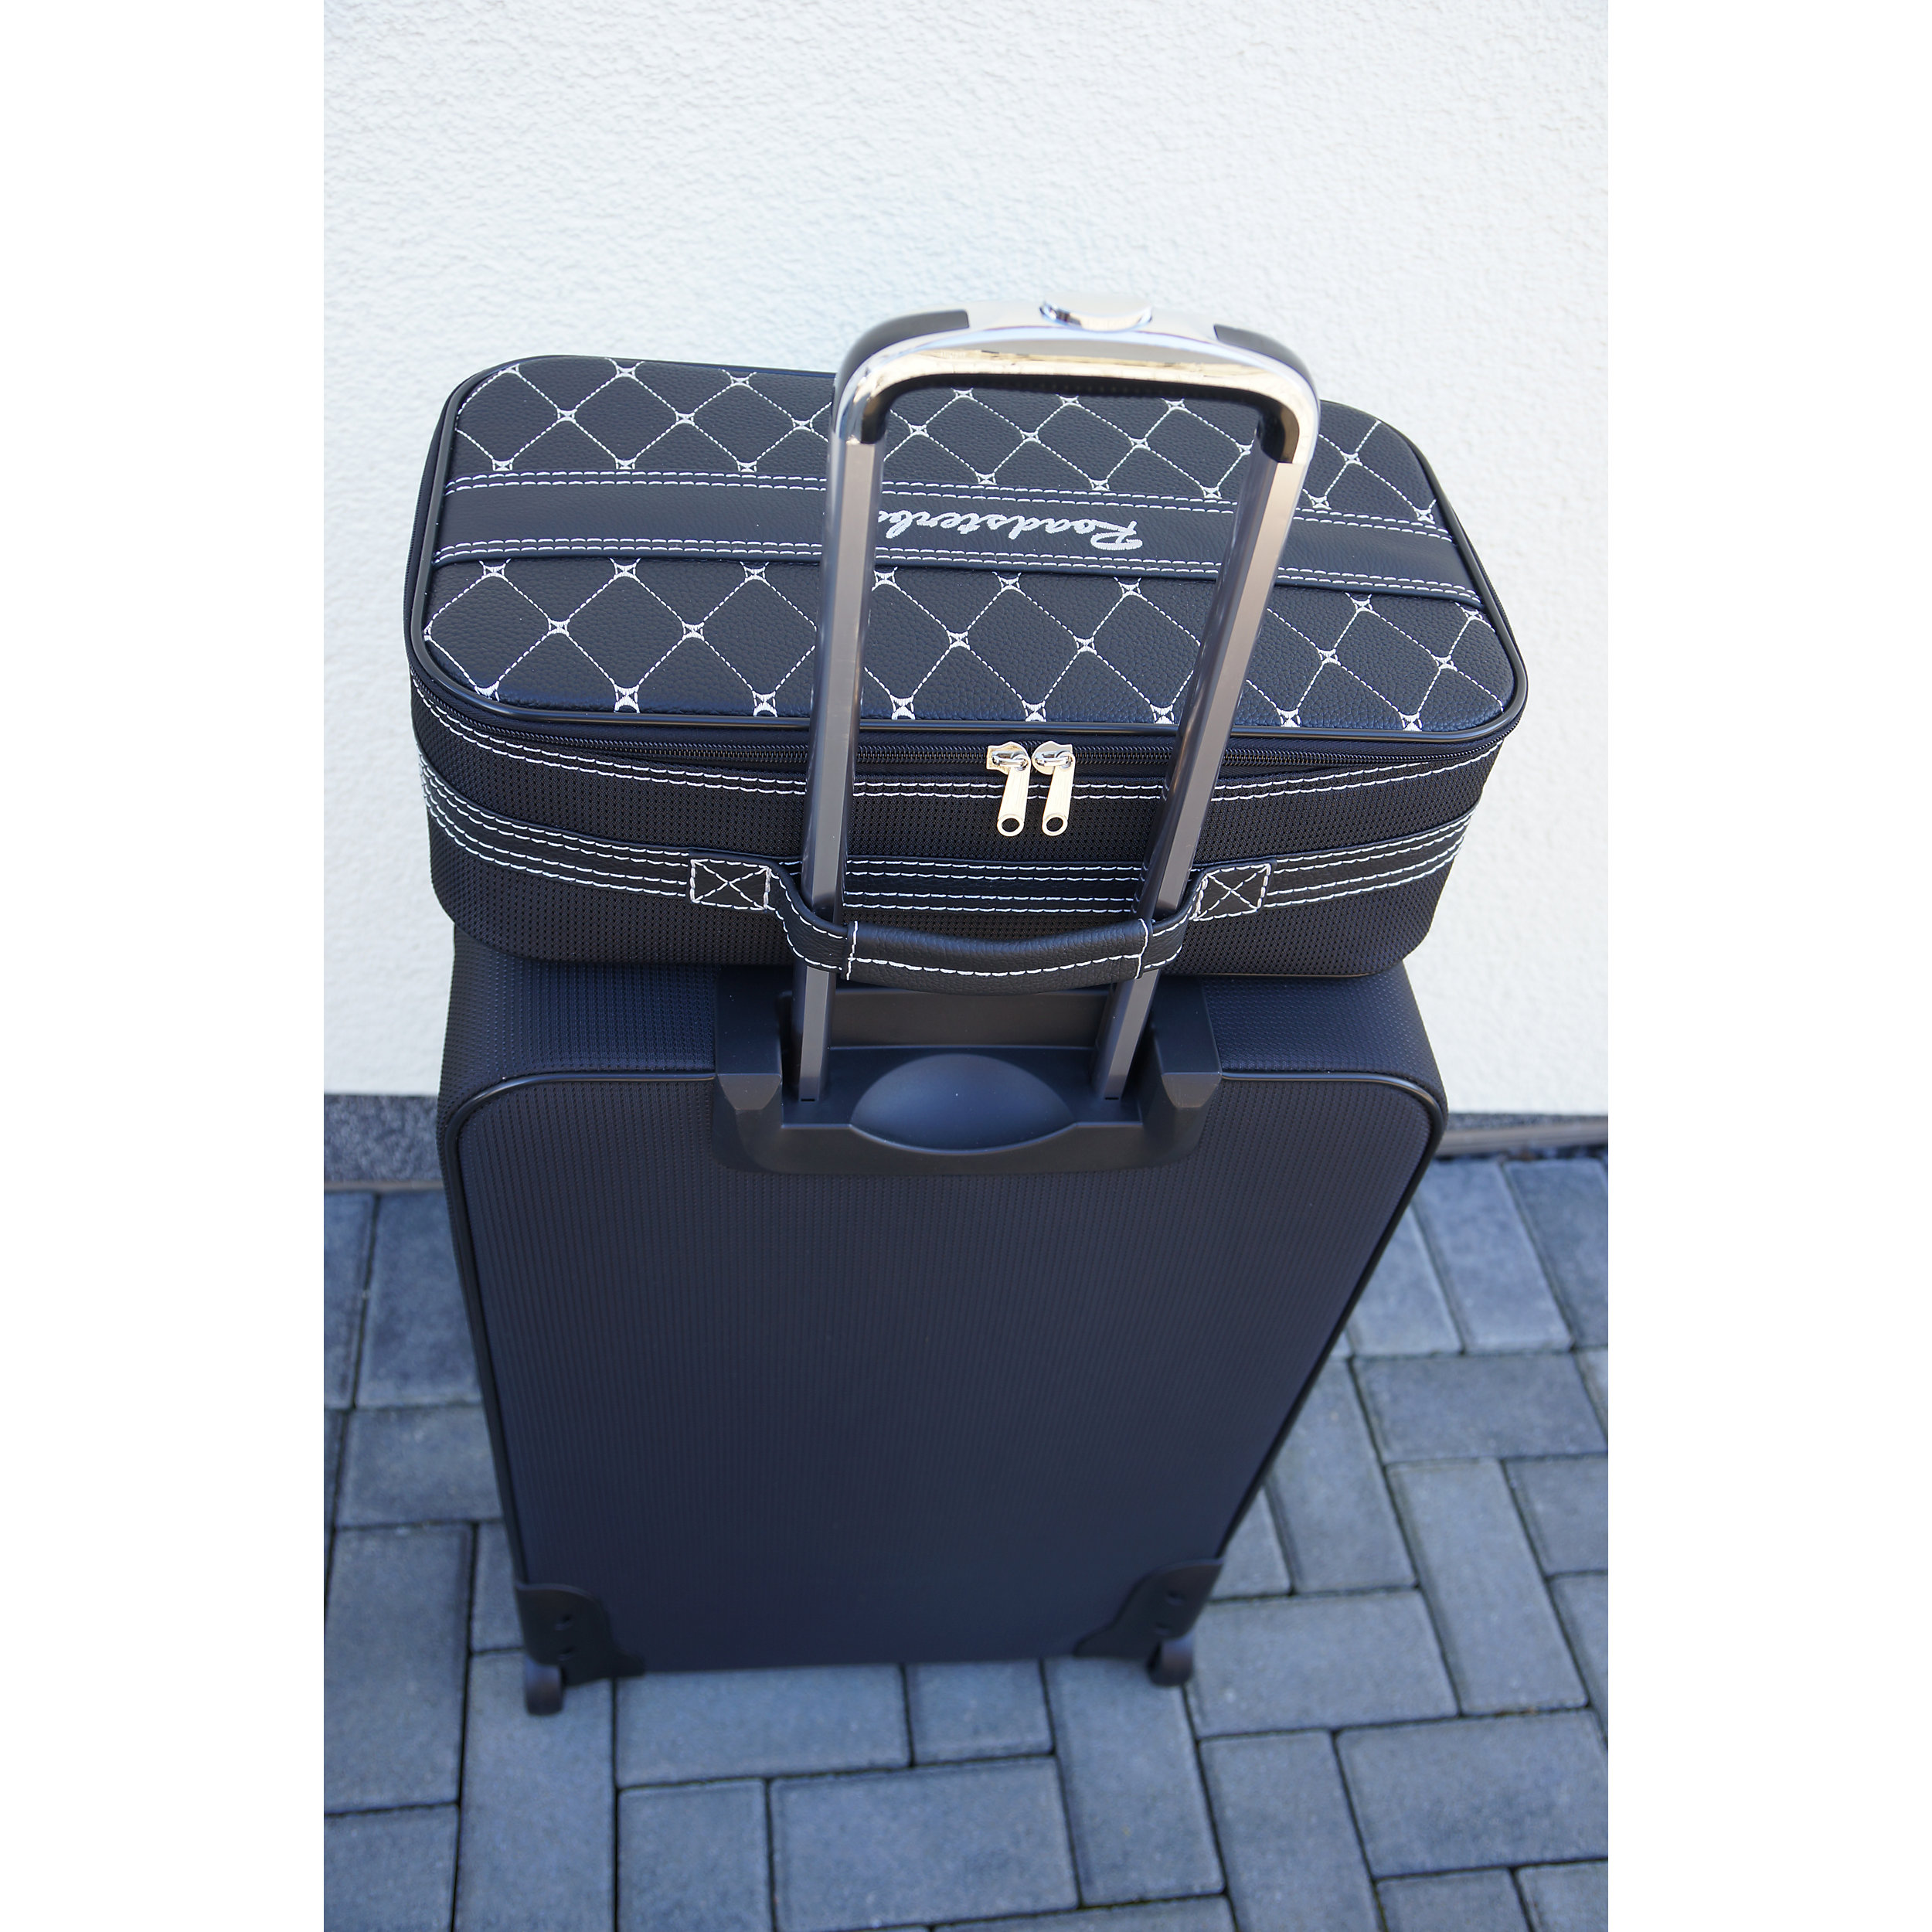 4-tlg. Kofferset mit 2 Rollen Mercedes E-Klasse Coupé 220 Liter